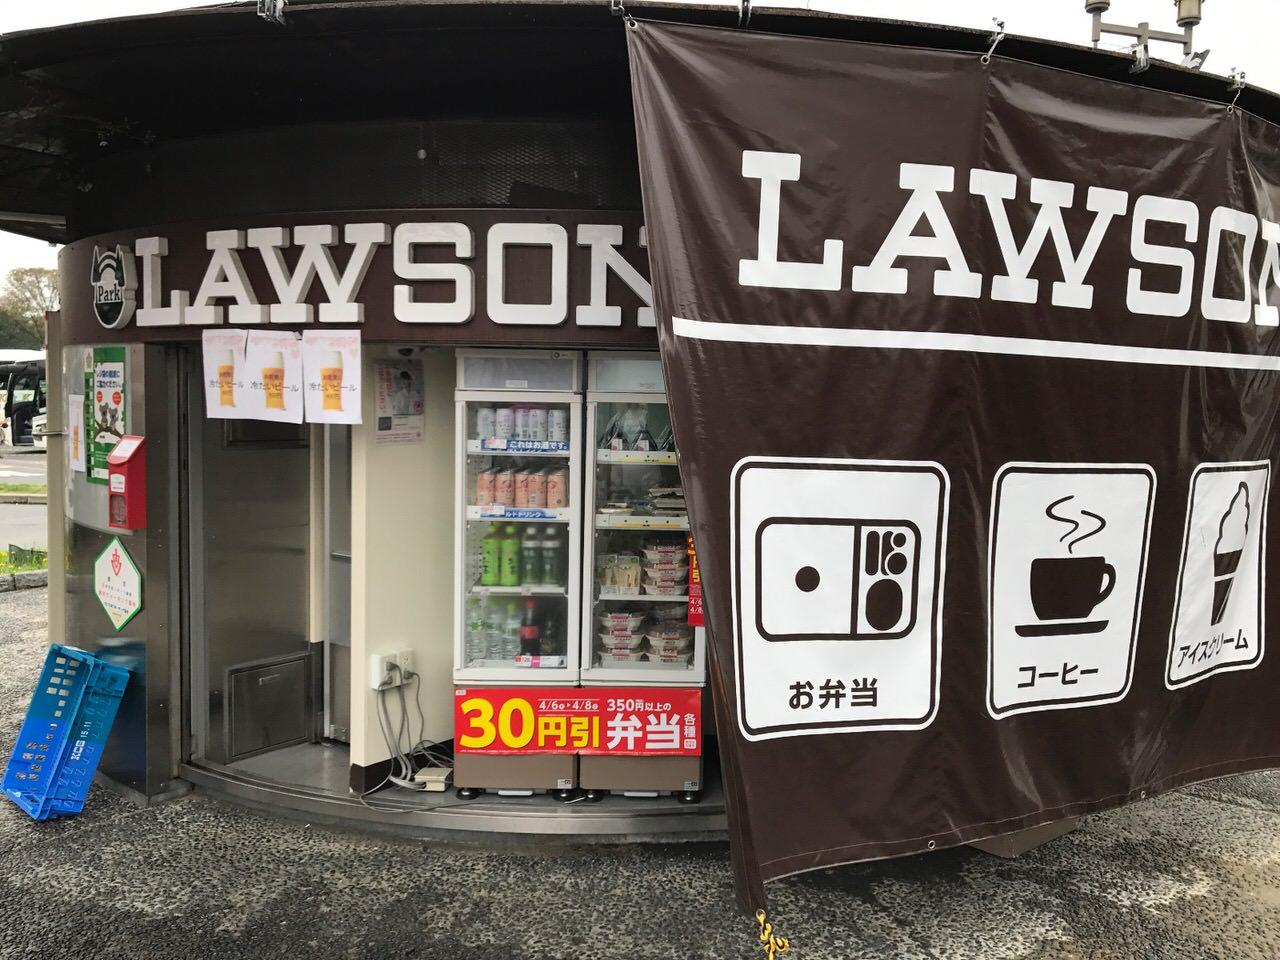 Lawson osaka castle 9319